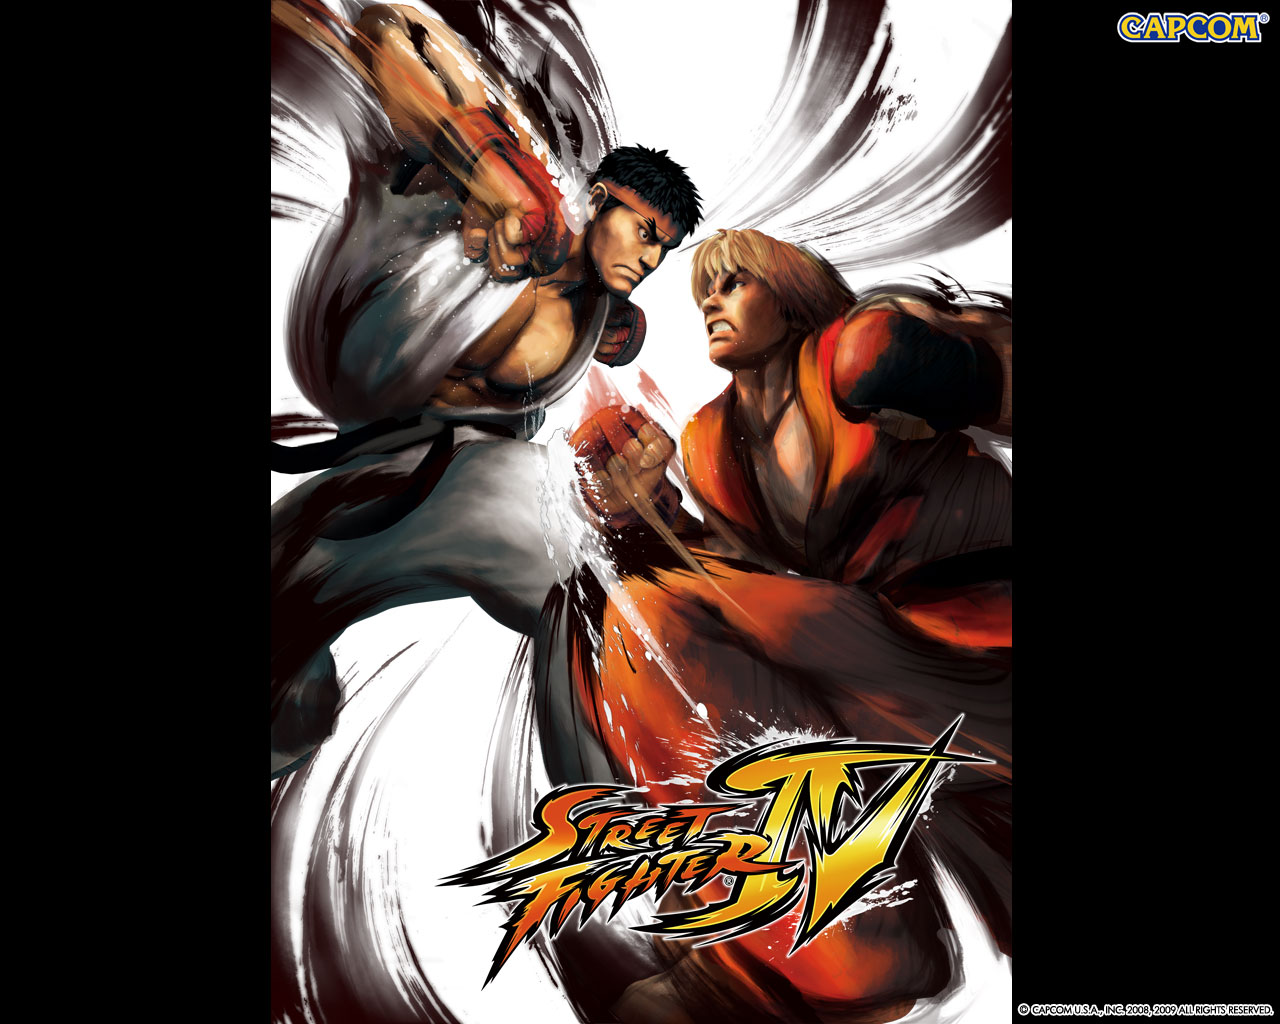 Обои Street Fighter на кулаках